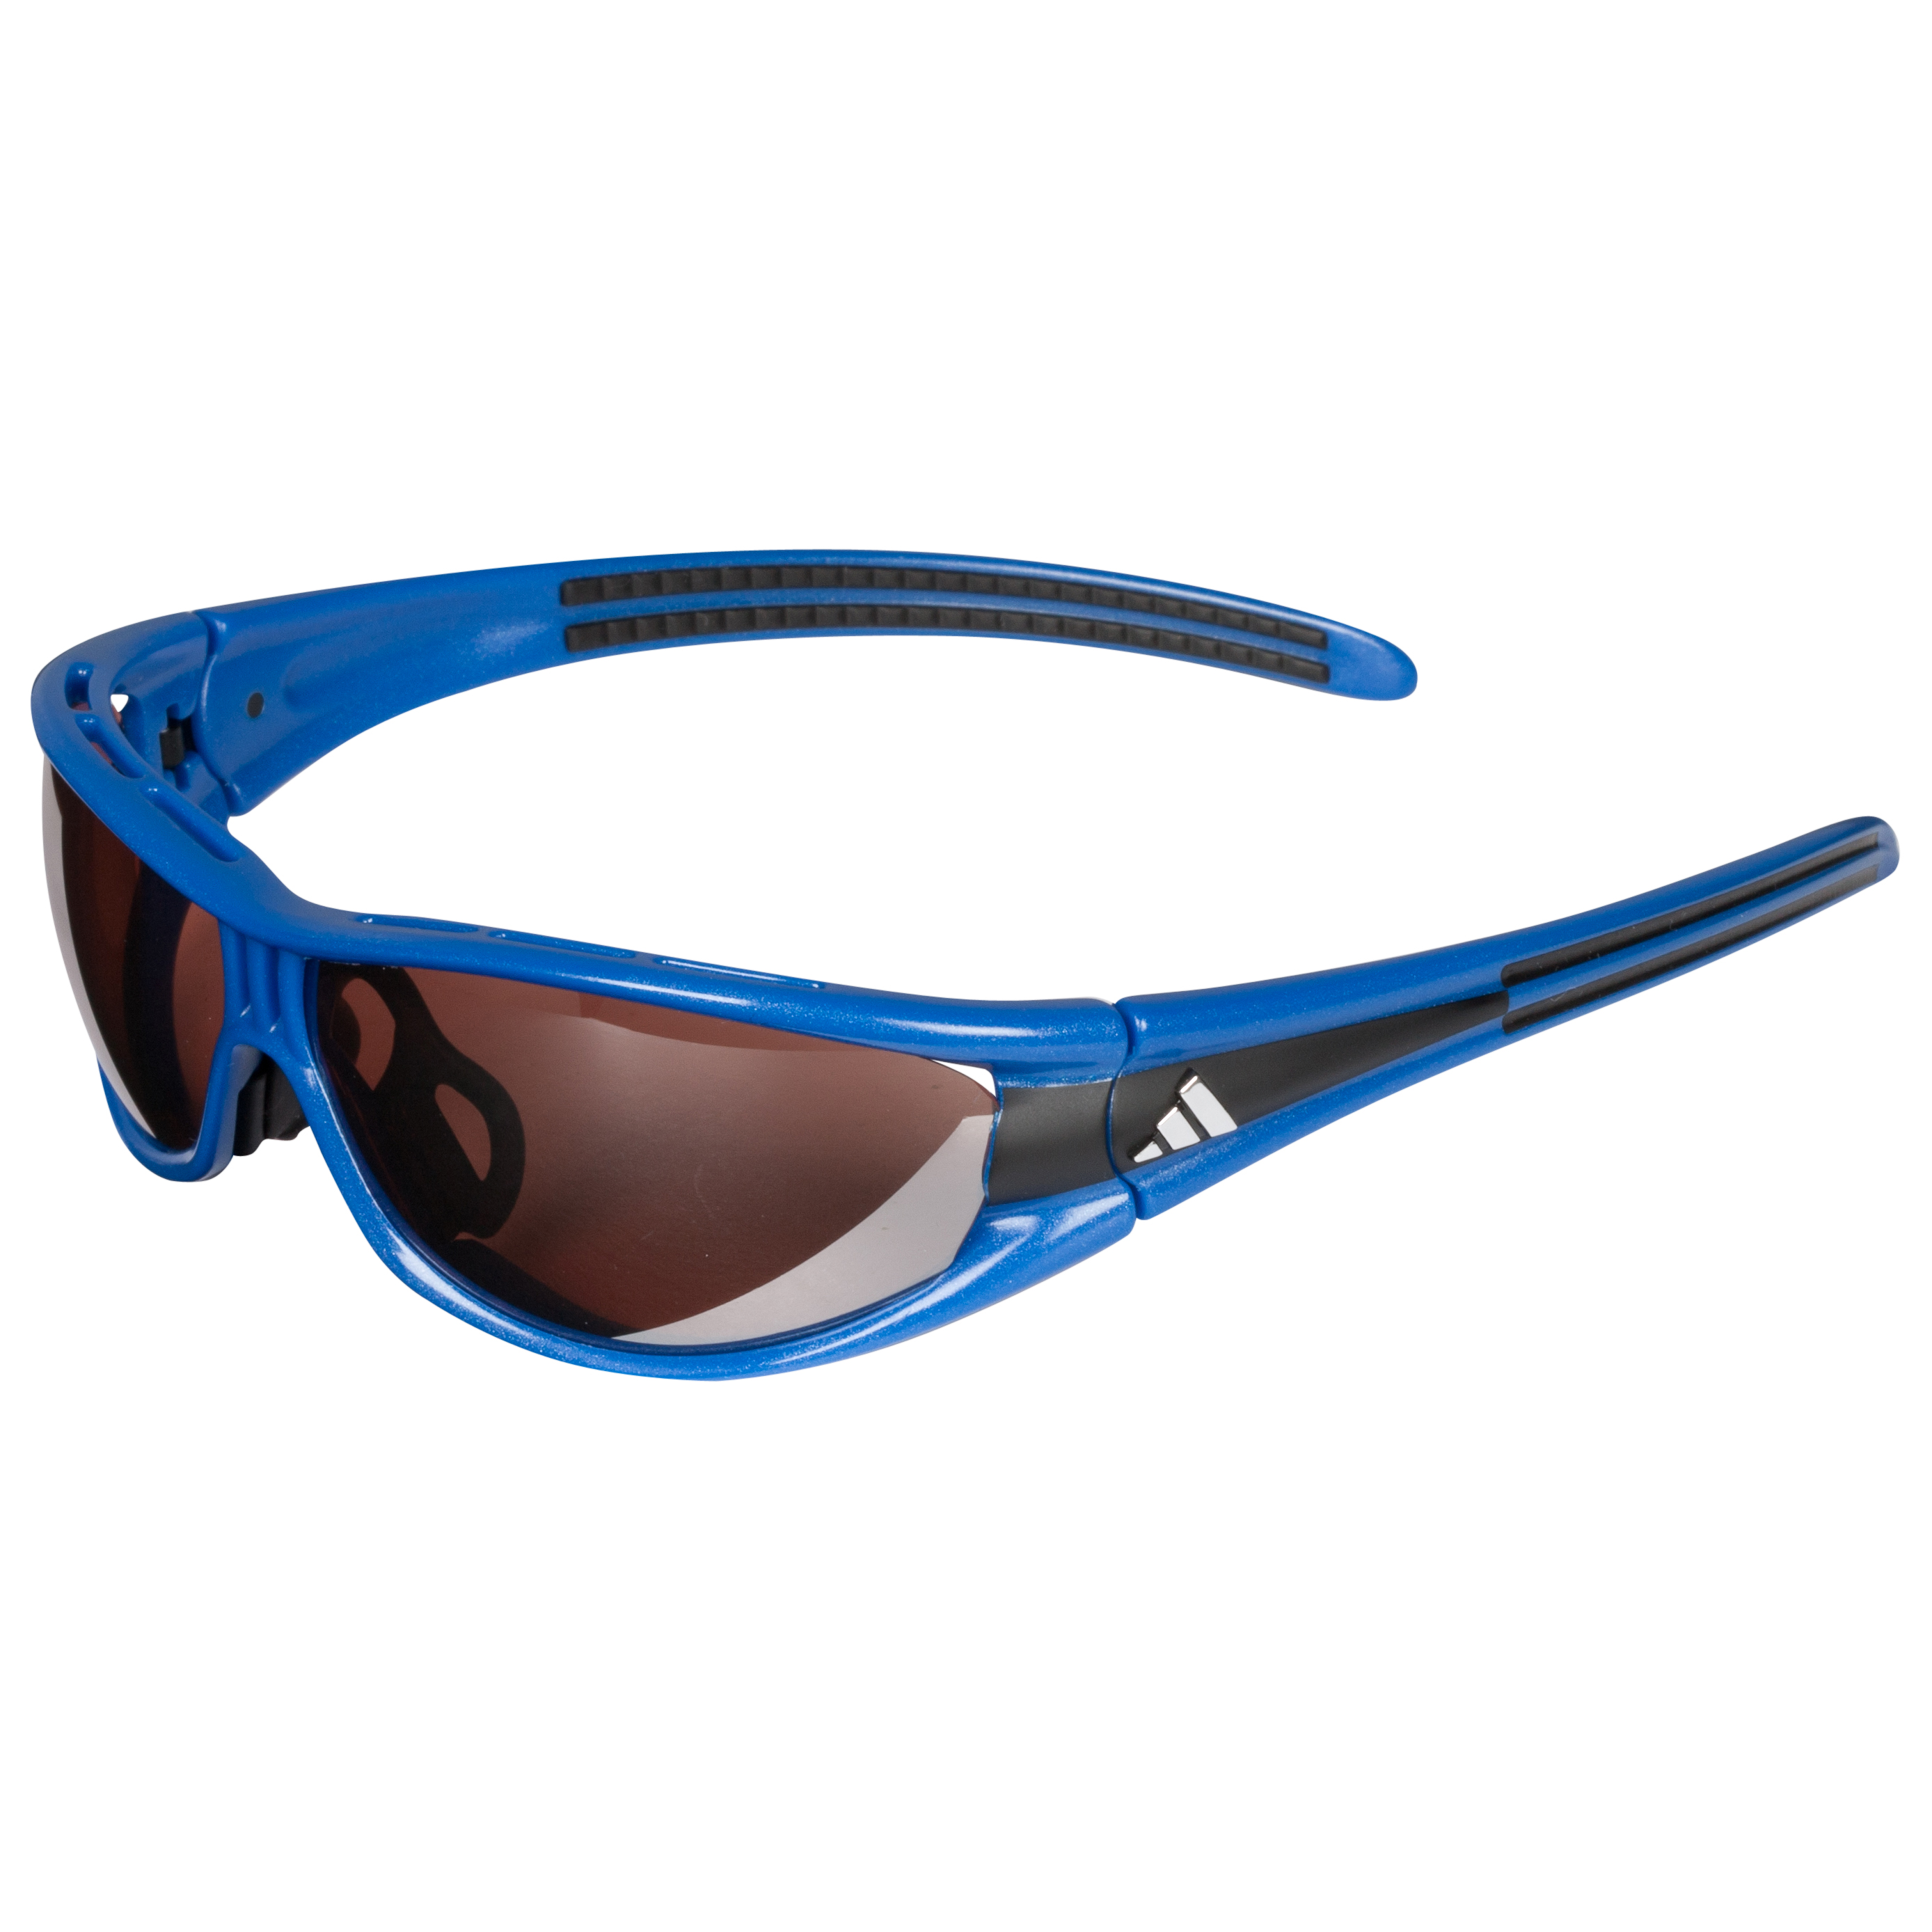 Adidas Evil Eye Sunglasses - Blue